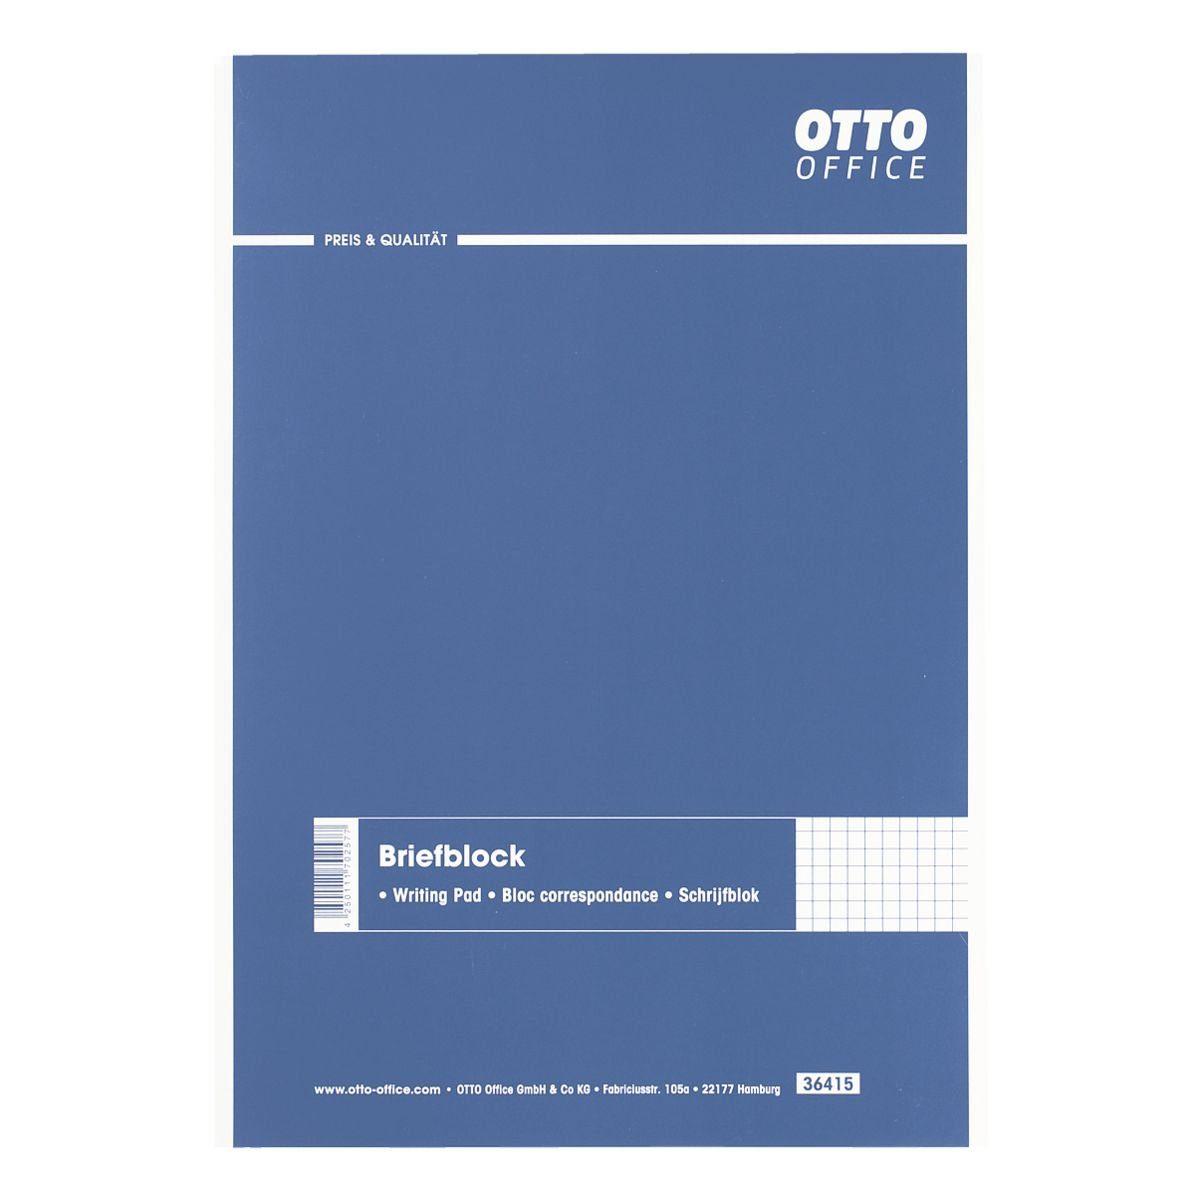 OTTO Office Standard Briefblock